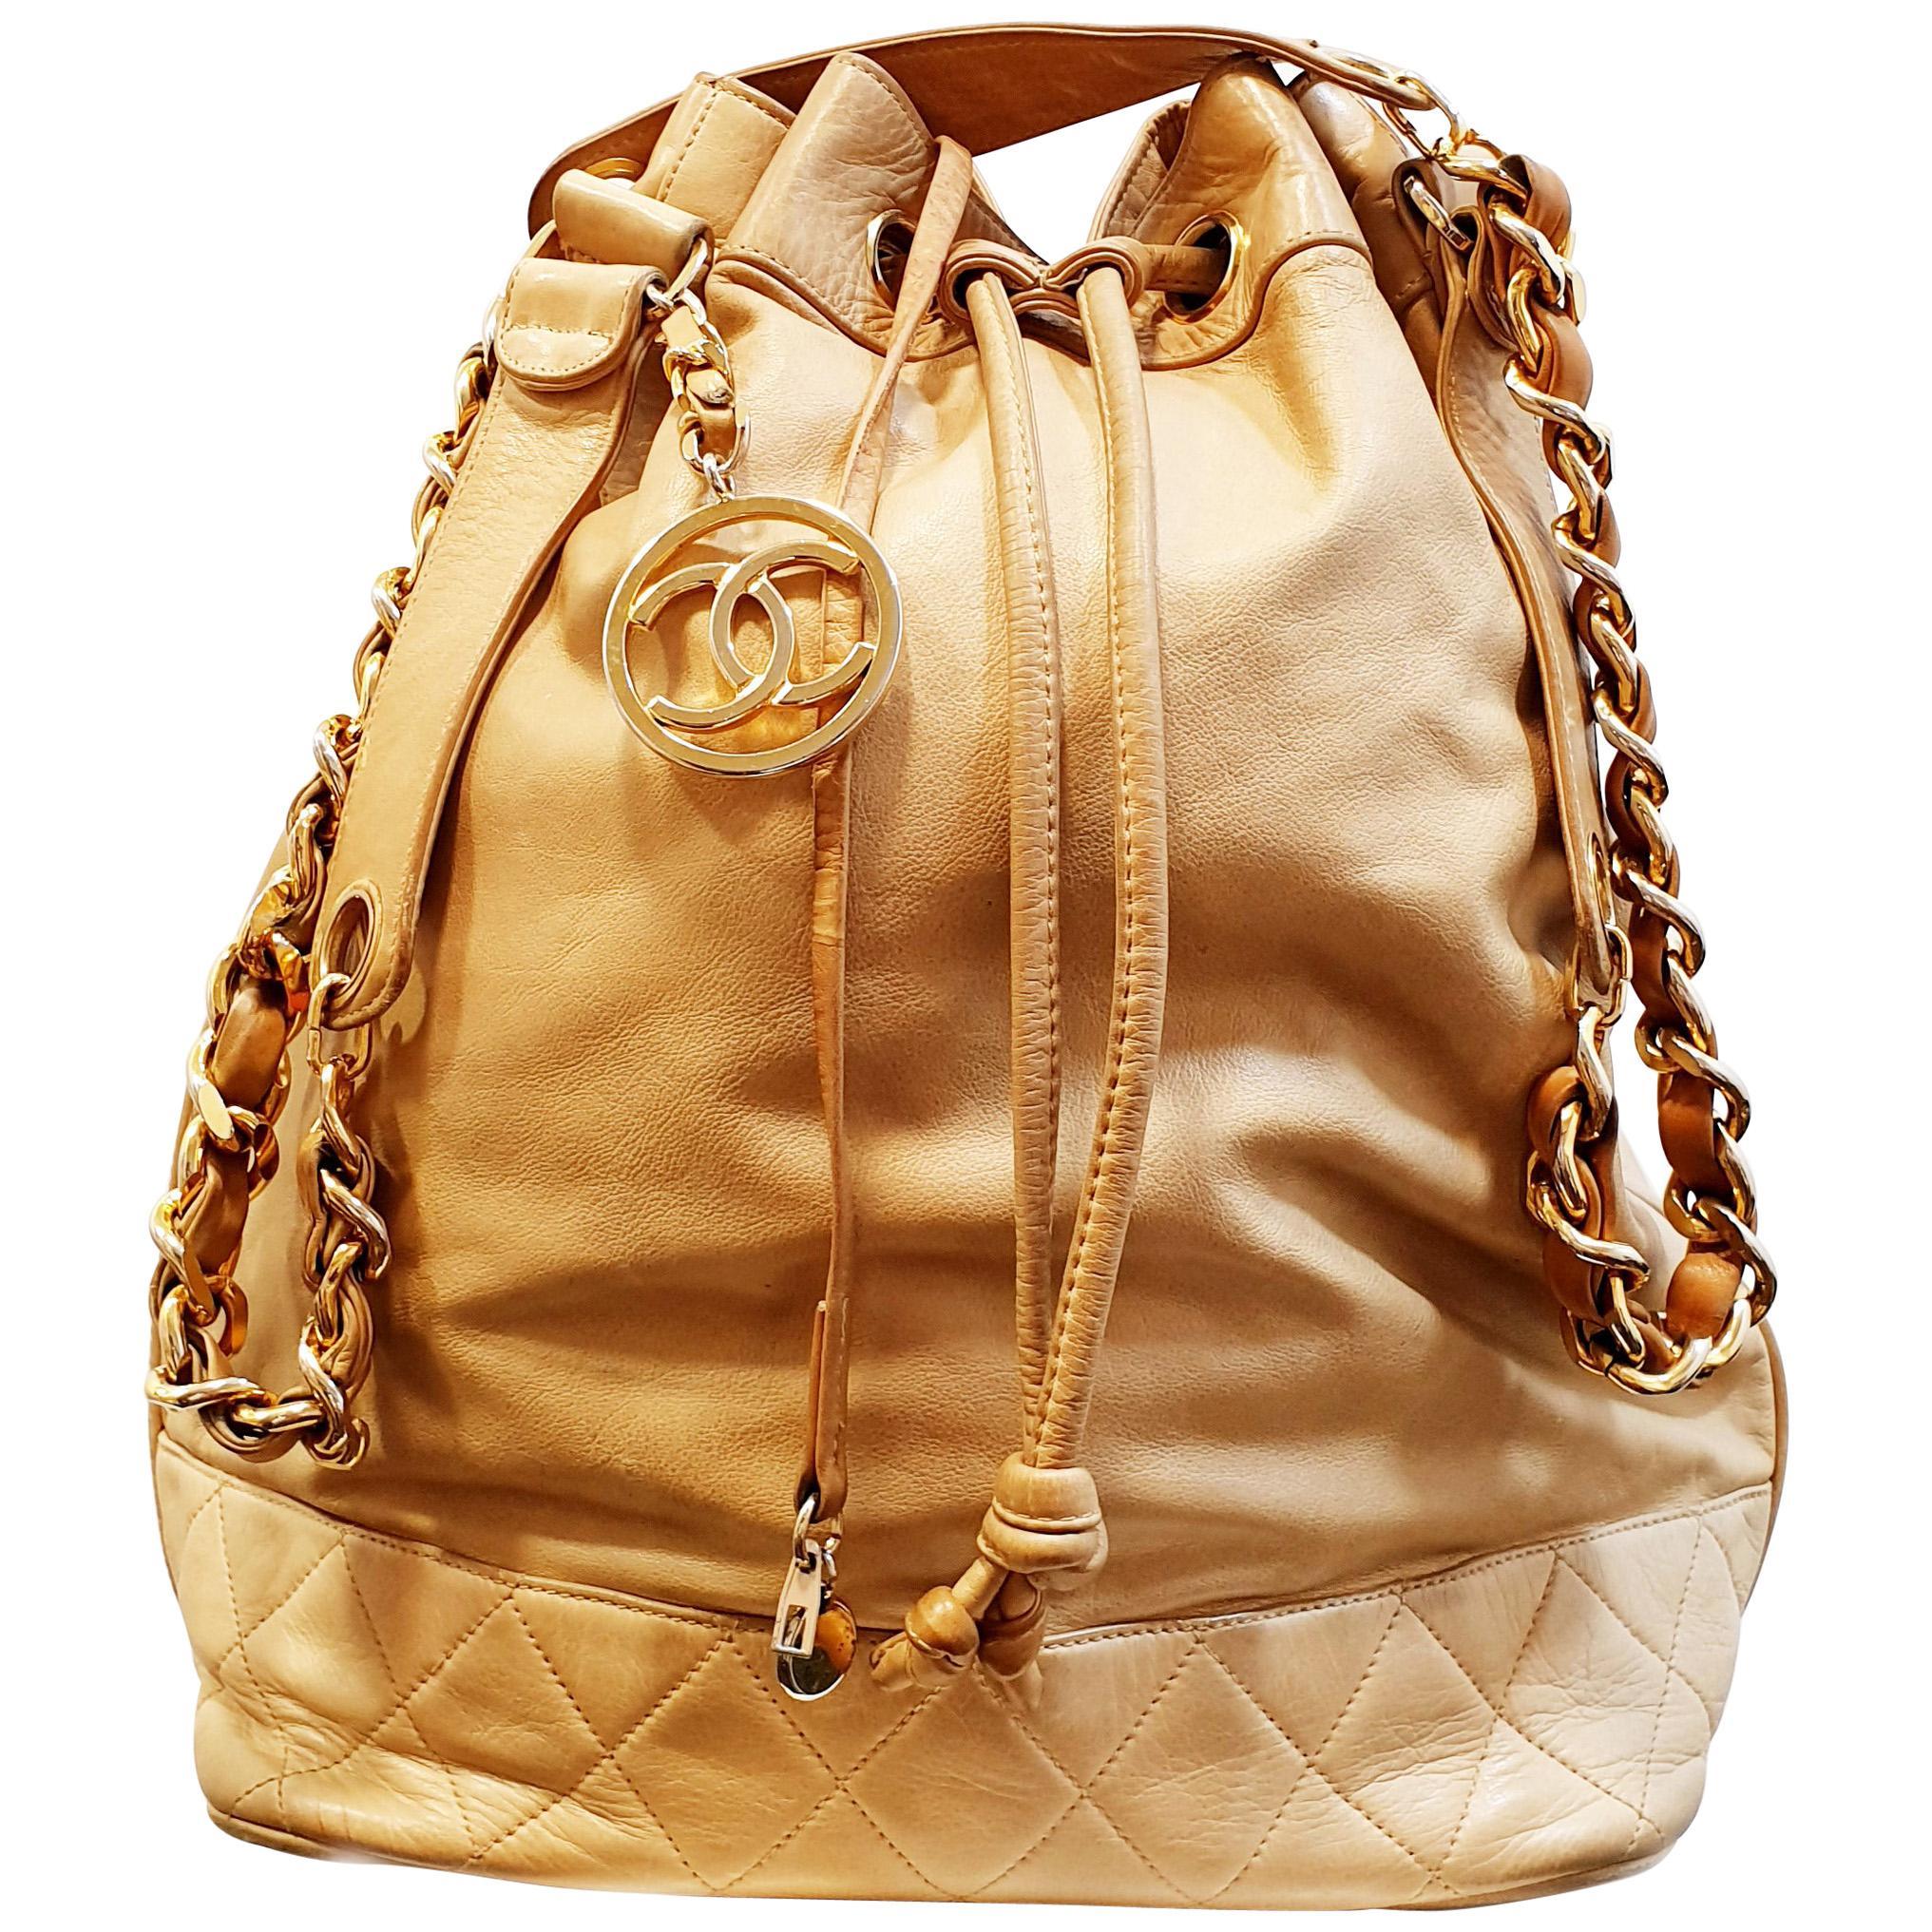 Vintage Beige Caramel Chanel Large drawstring bag lambskin with gold metal